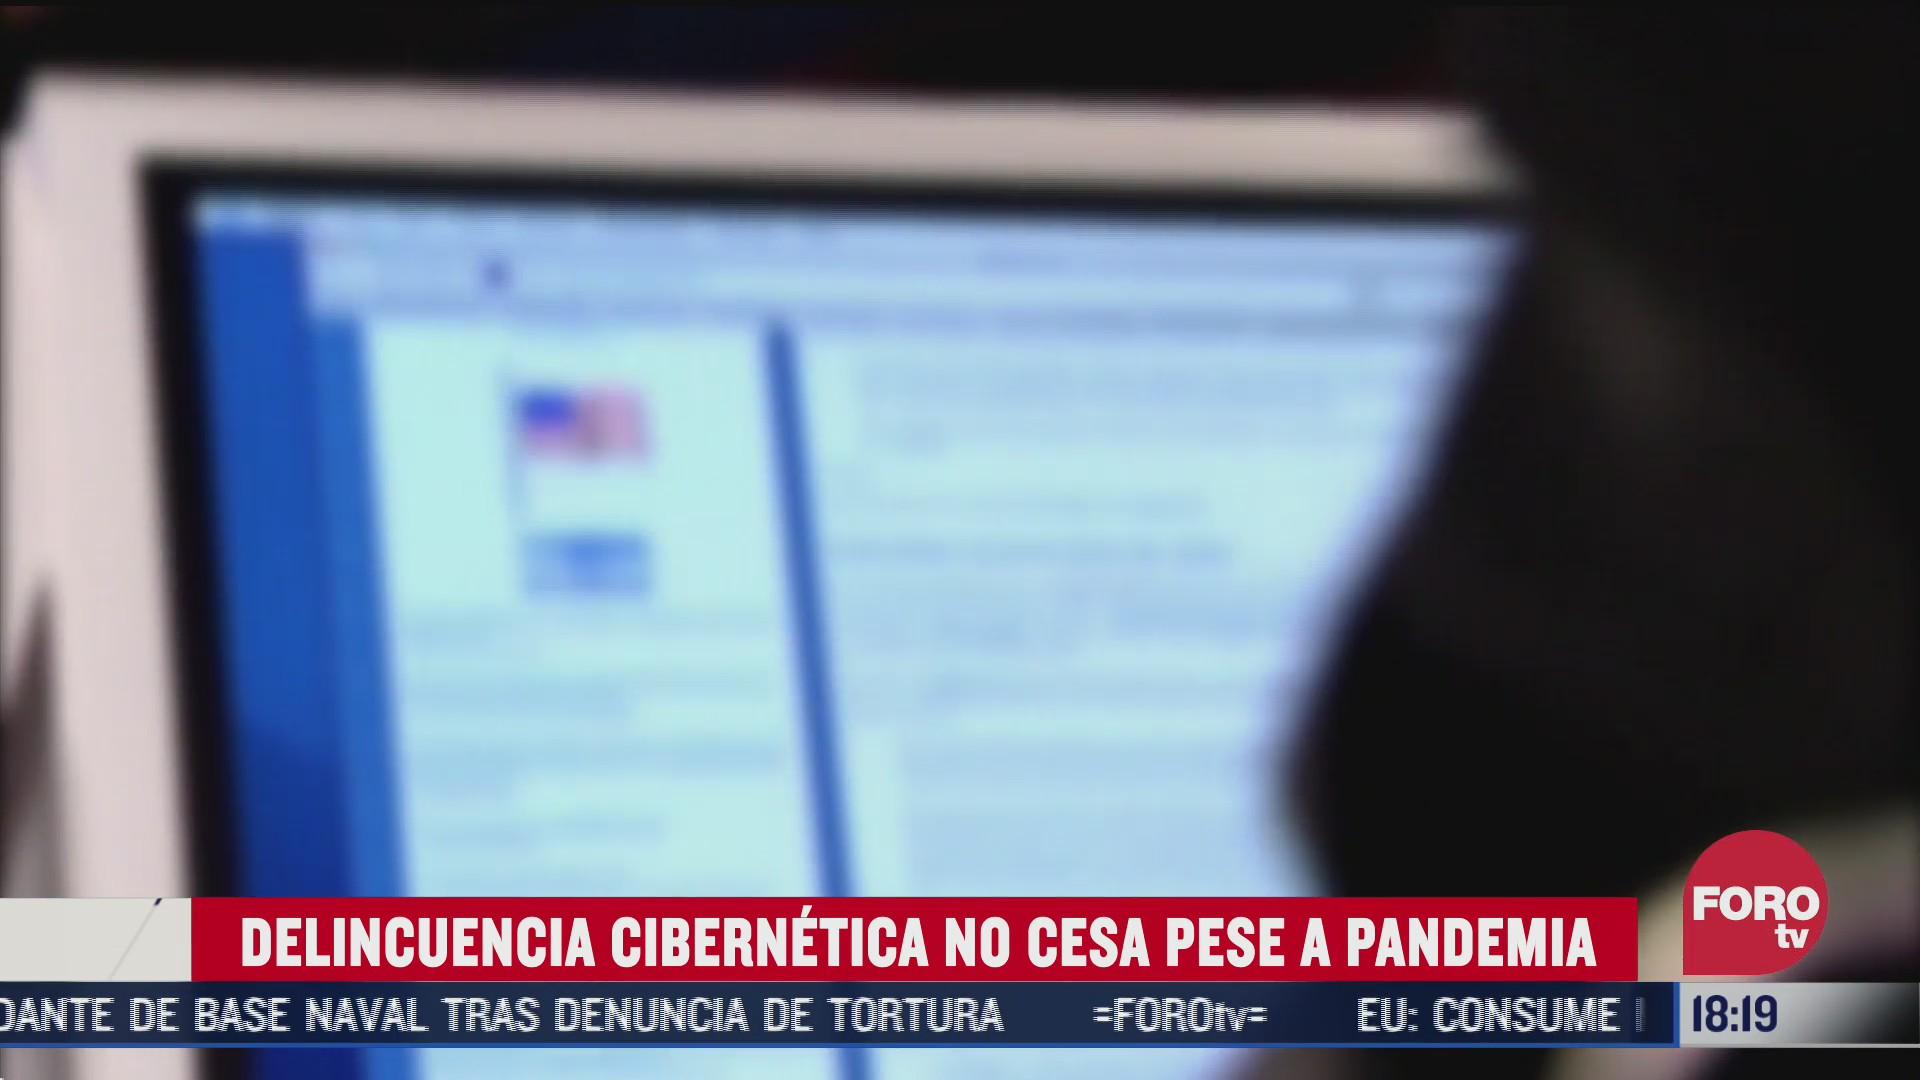 fraudes ciberneticos no cesan pese a pandemia de covid